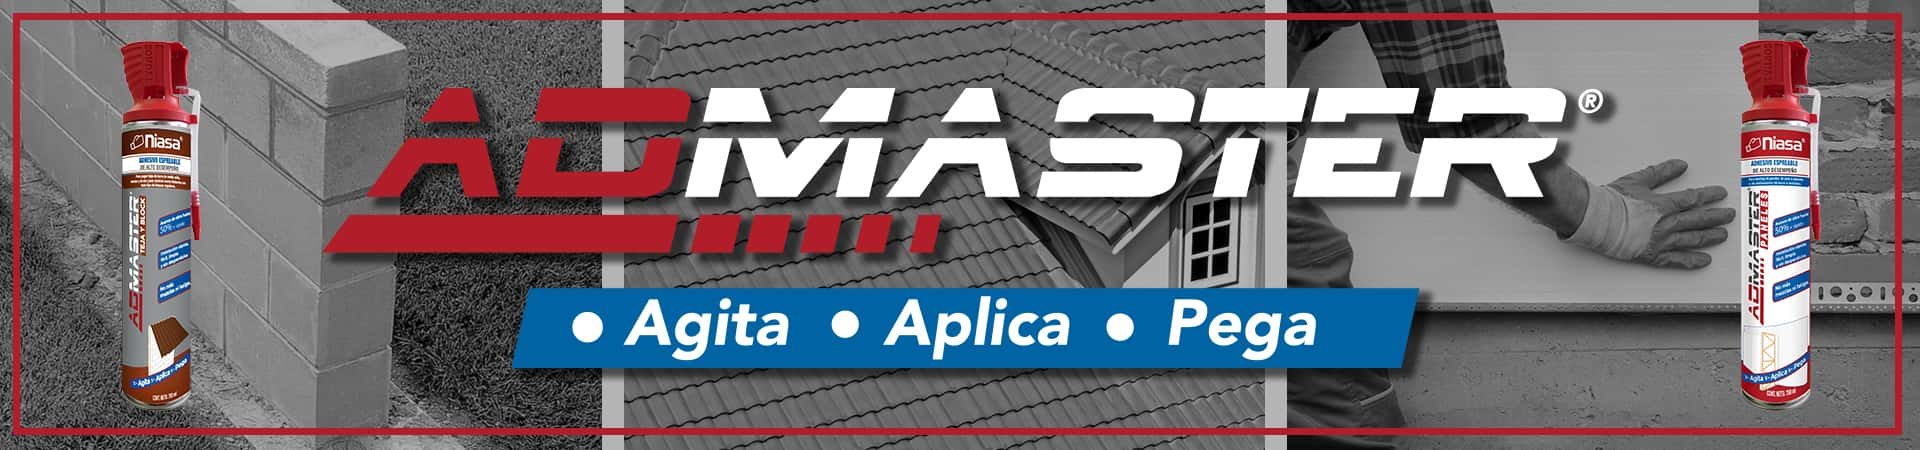 admaster niasa banner-home